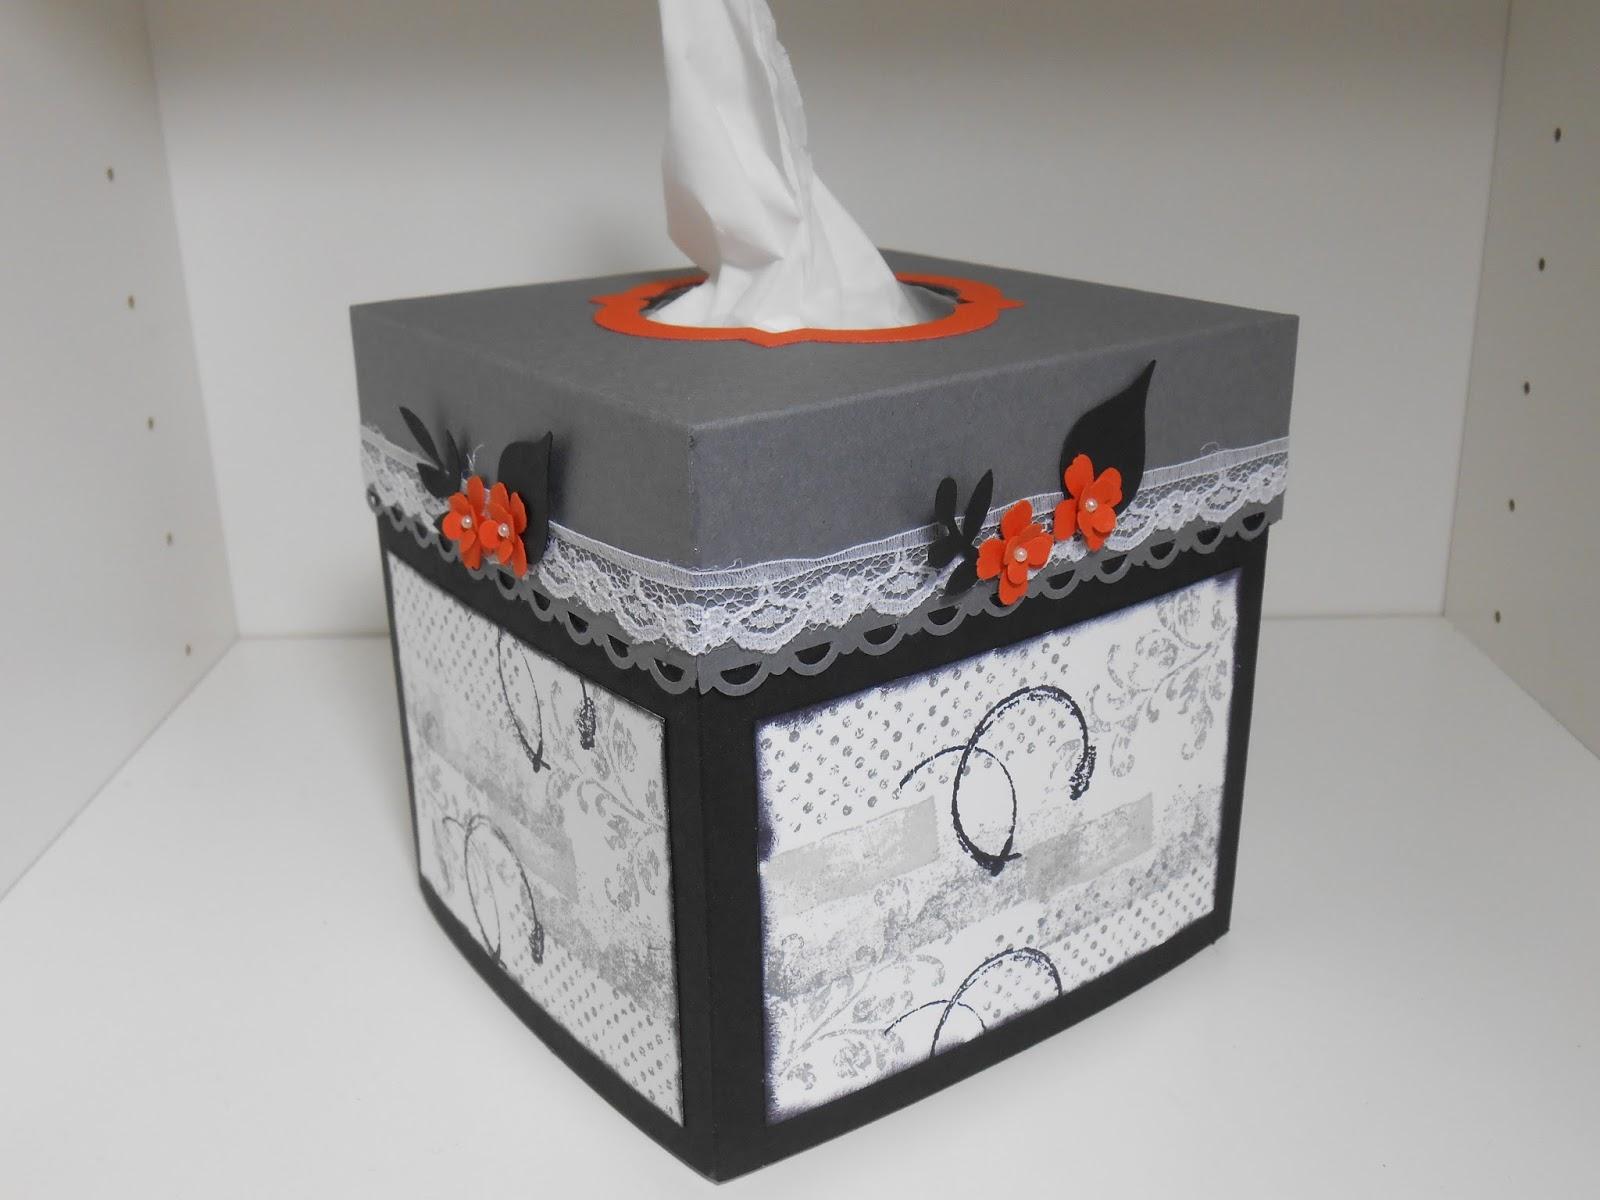 herzchen box f r kosmetikt cher. Black Bedroom Furniture Sets. Home Design Ideas